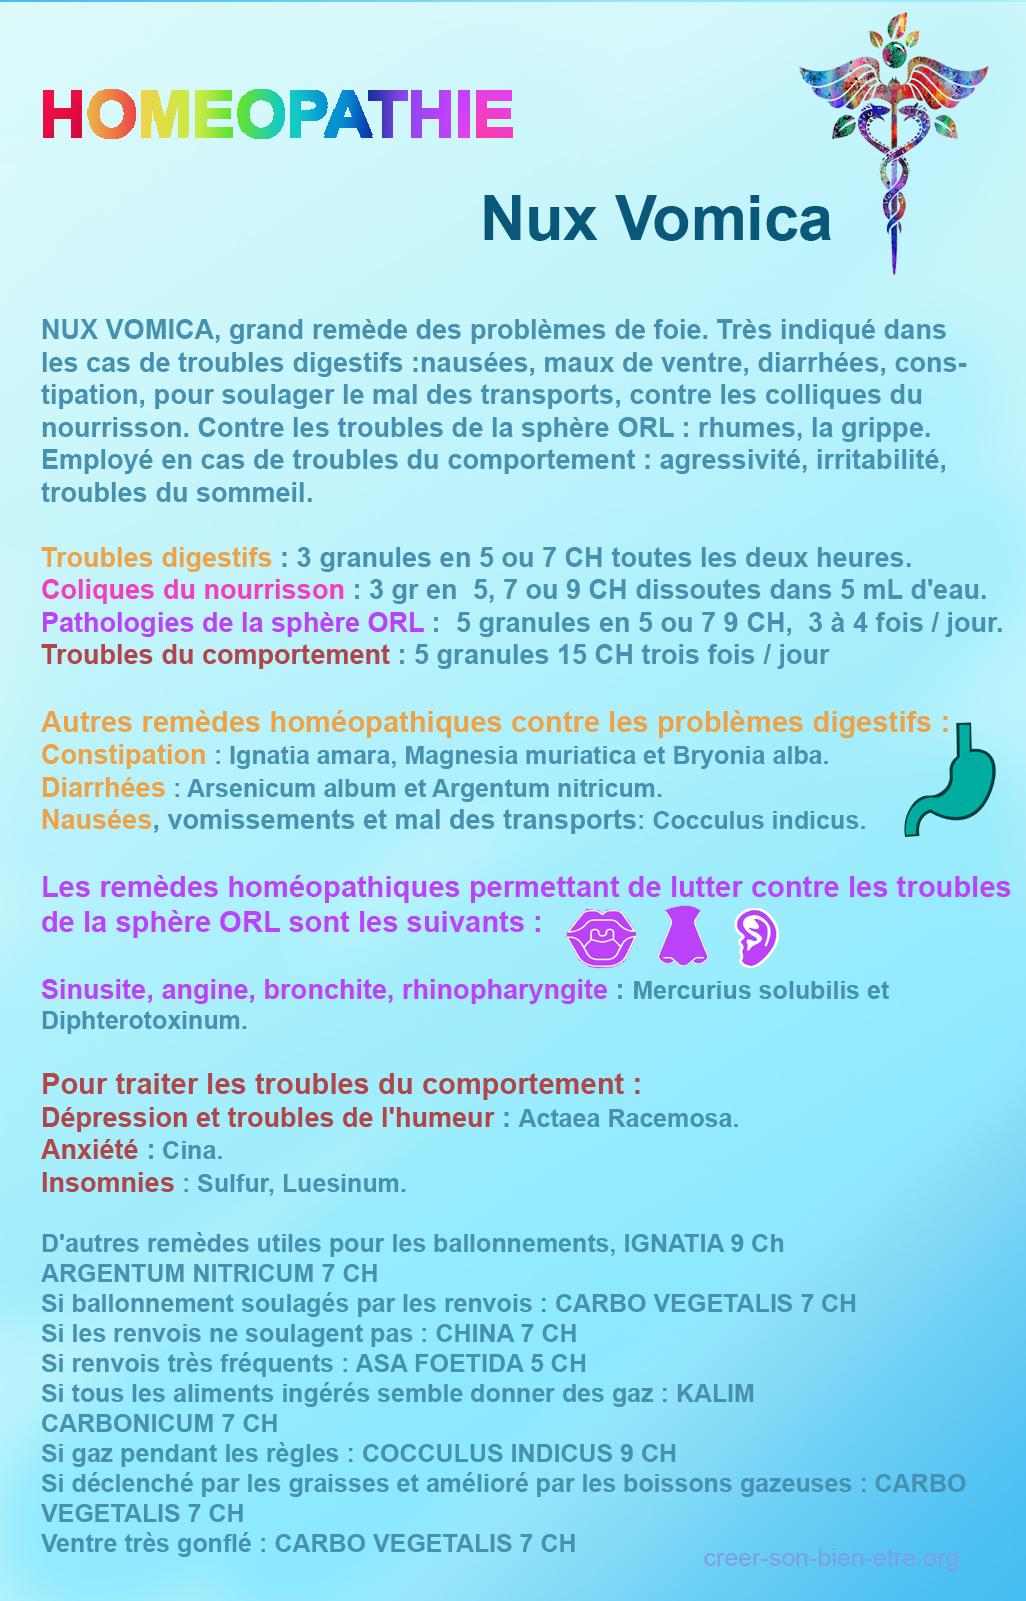 nux vomica 1.jpg